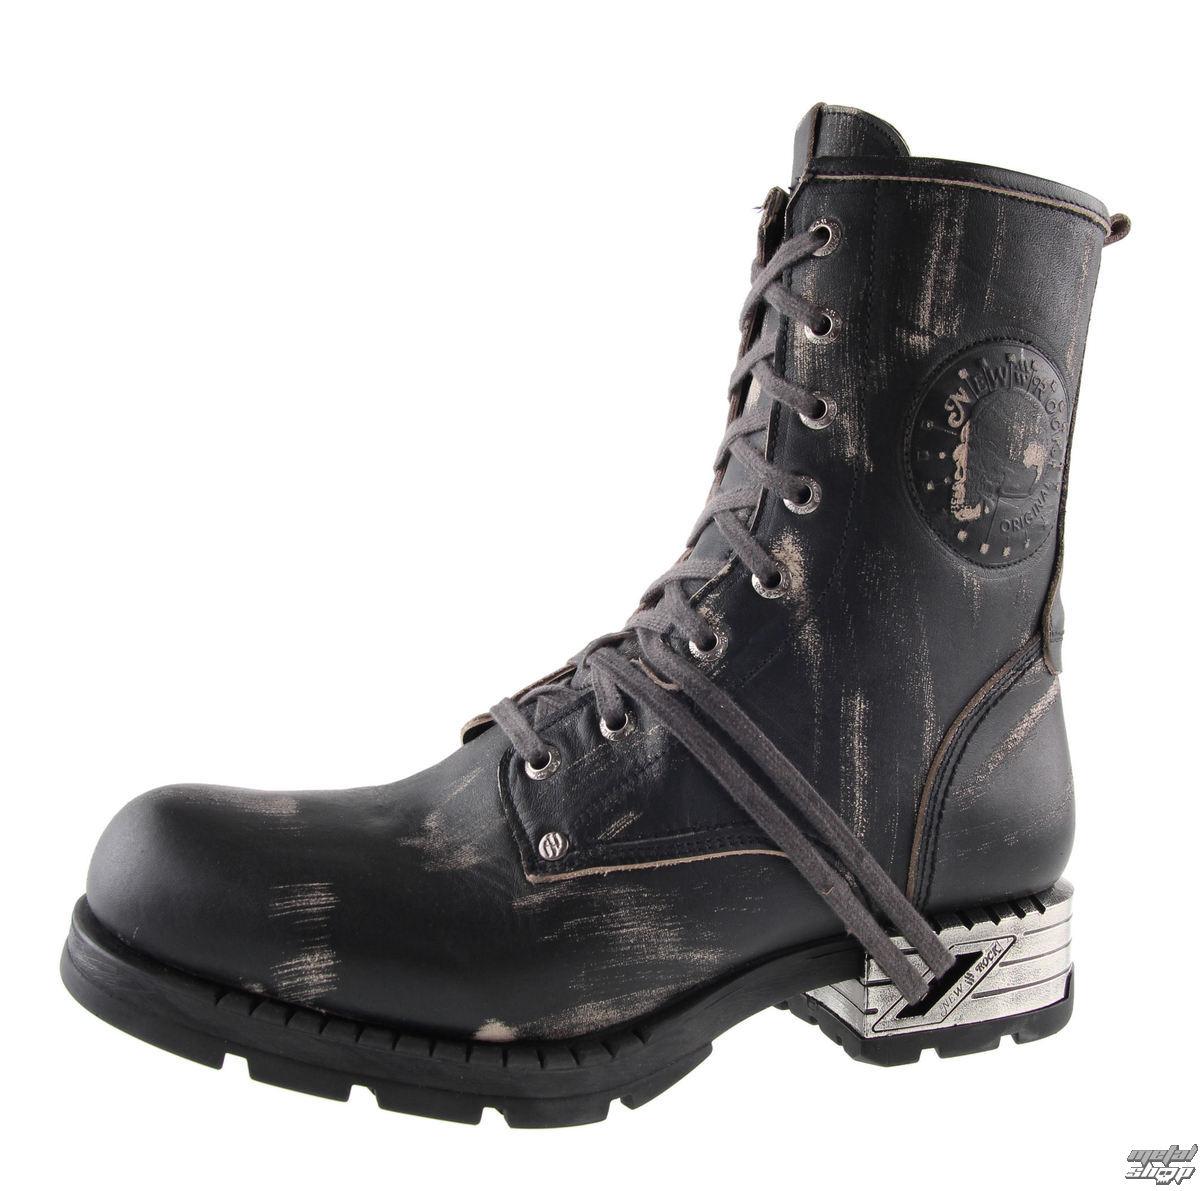 pick up d3804 61ee4 stivali in pelle uomo - NEW ROCK